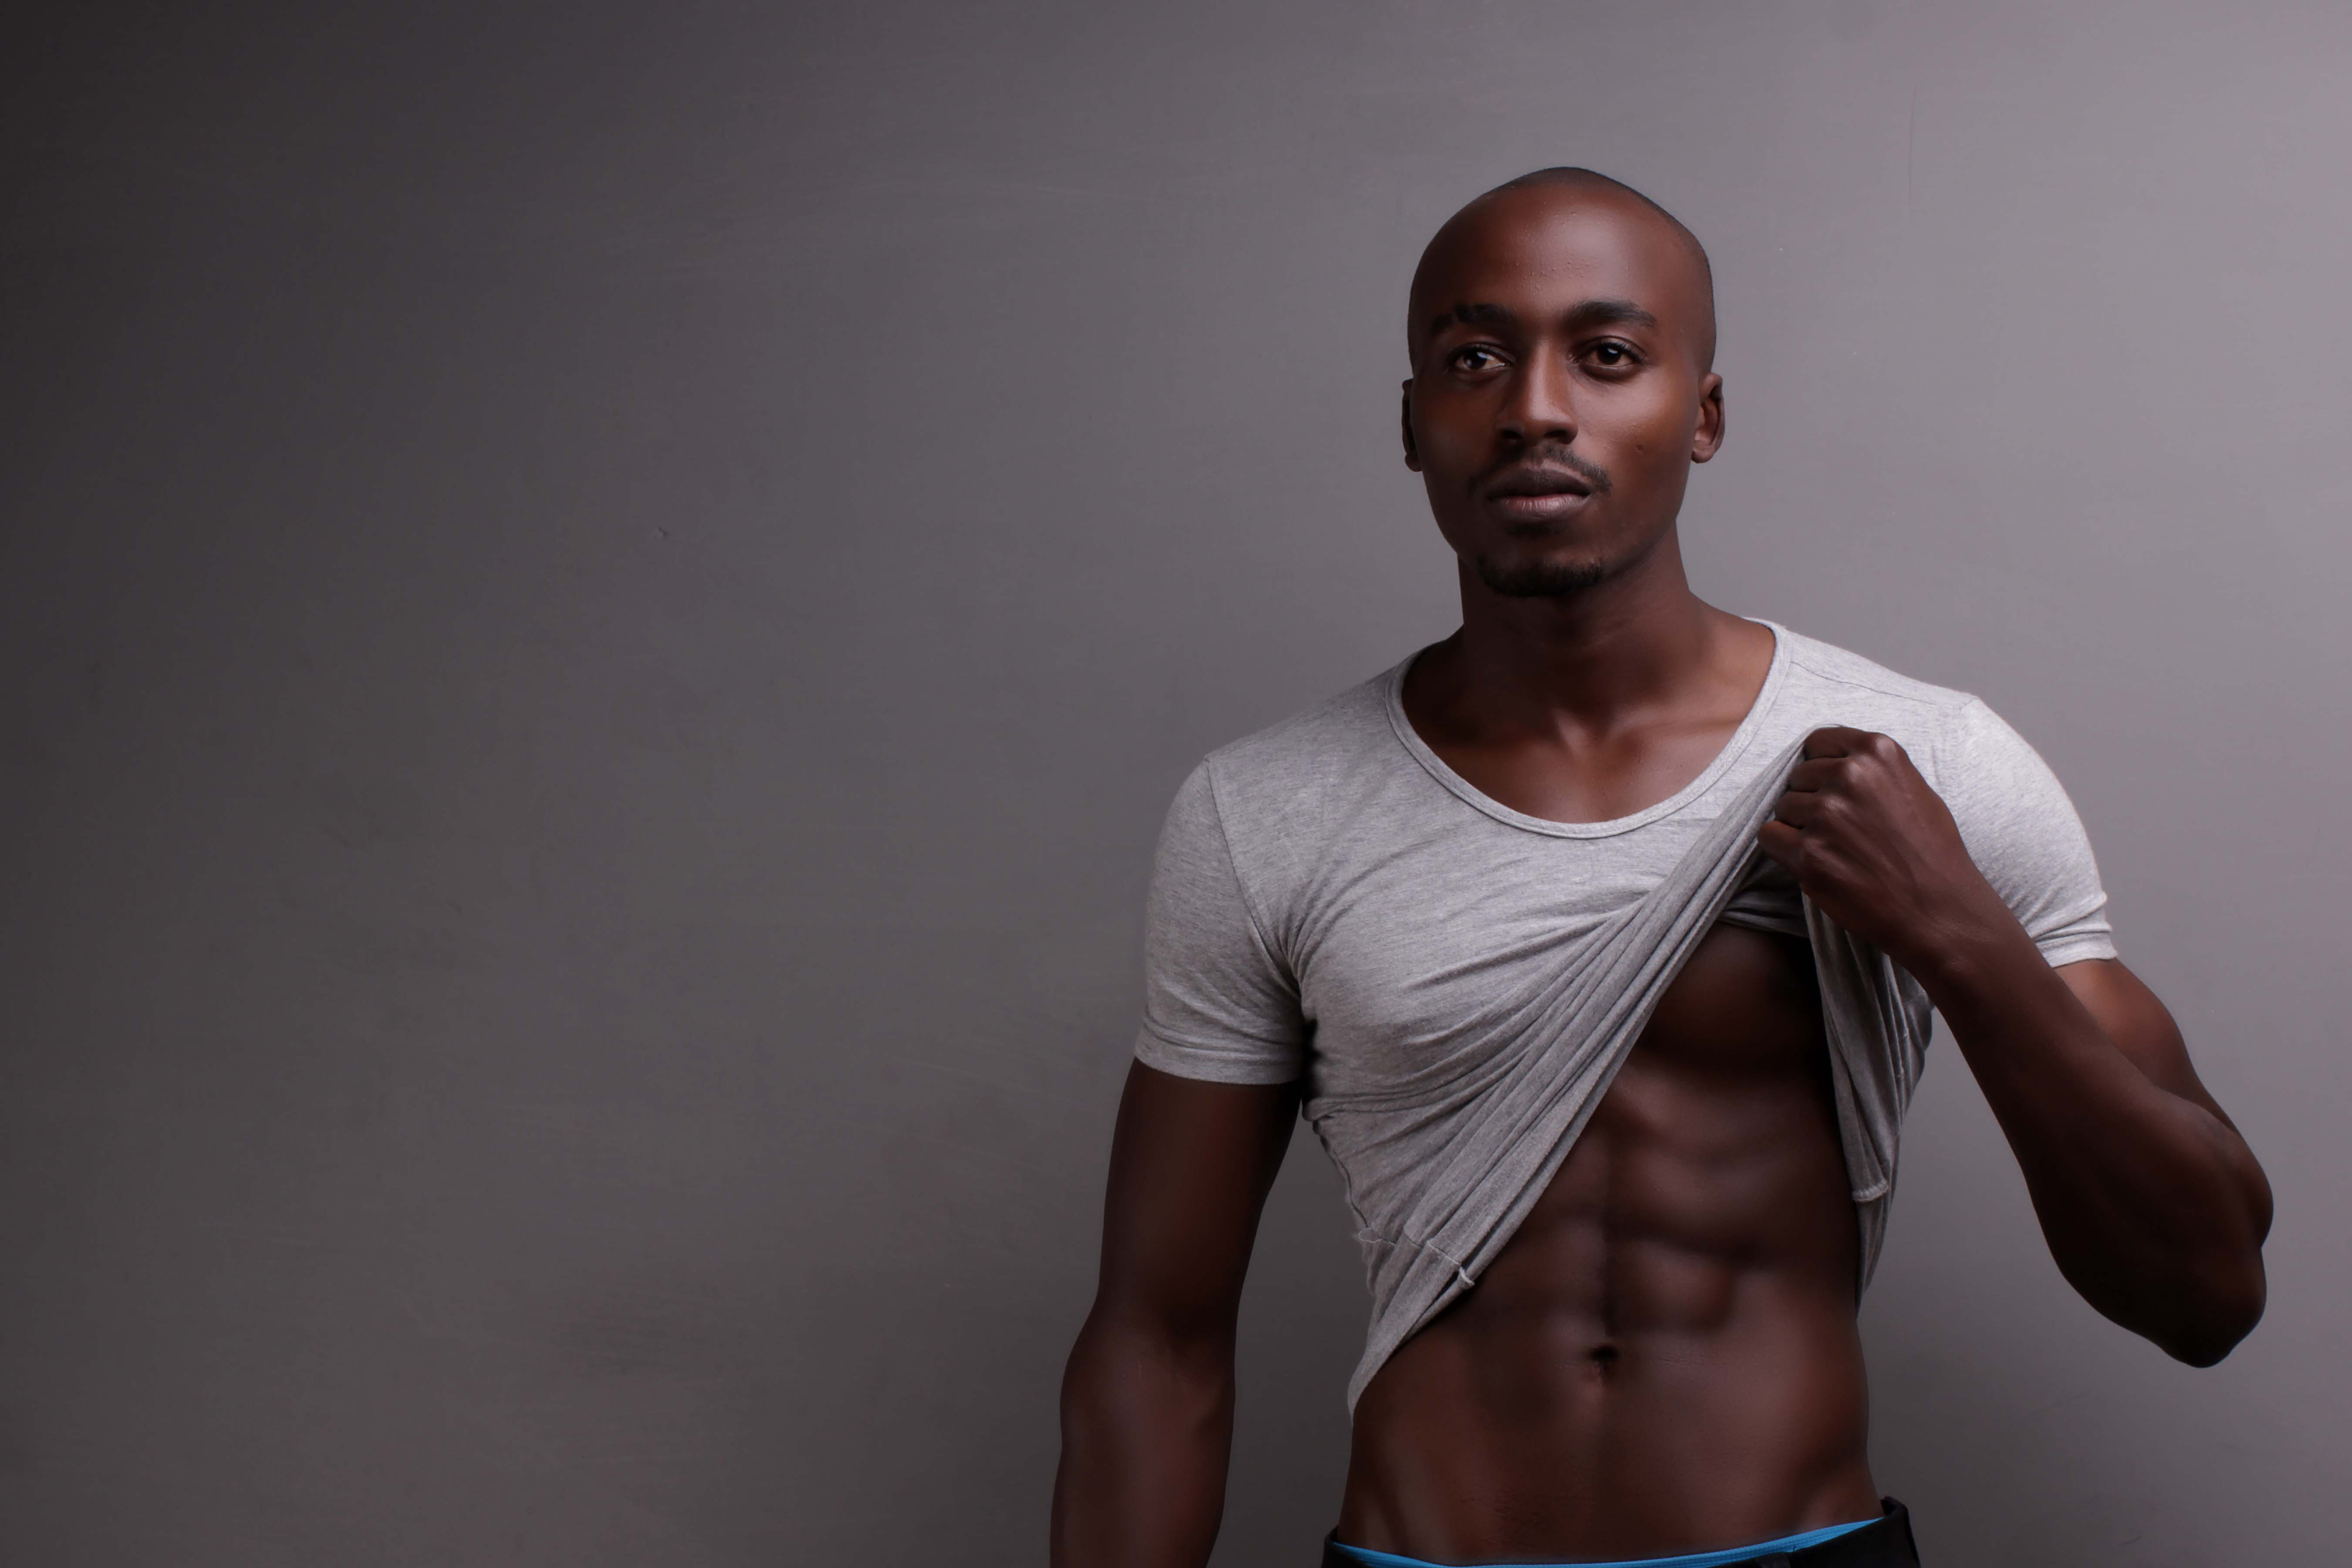 nairobi fashion photographer | Edgar Whisper Eragon